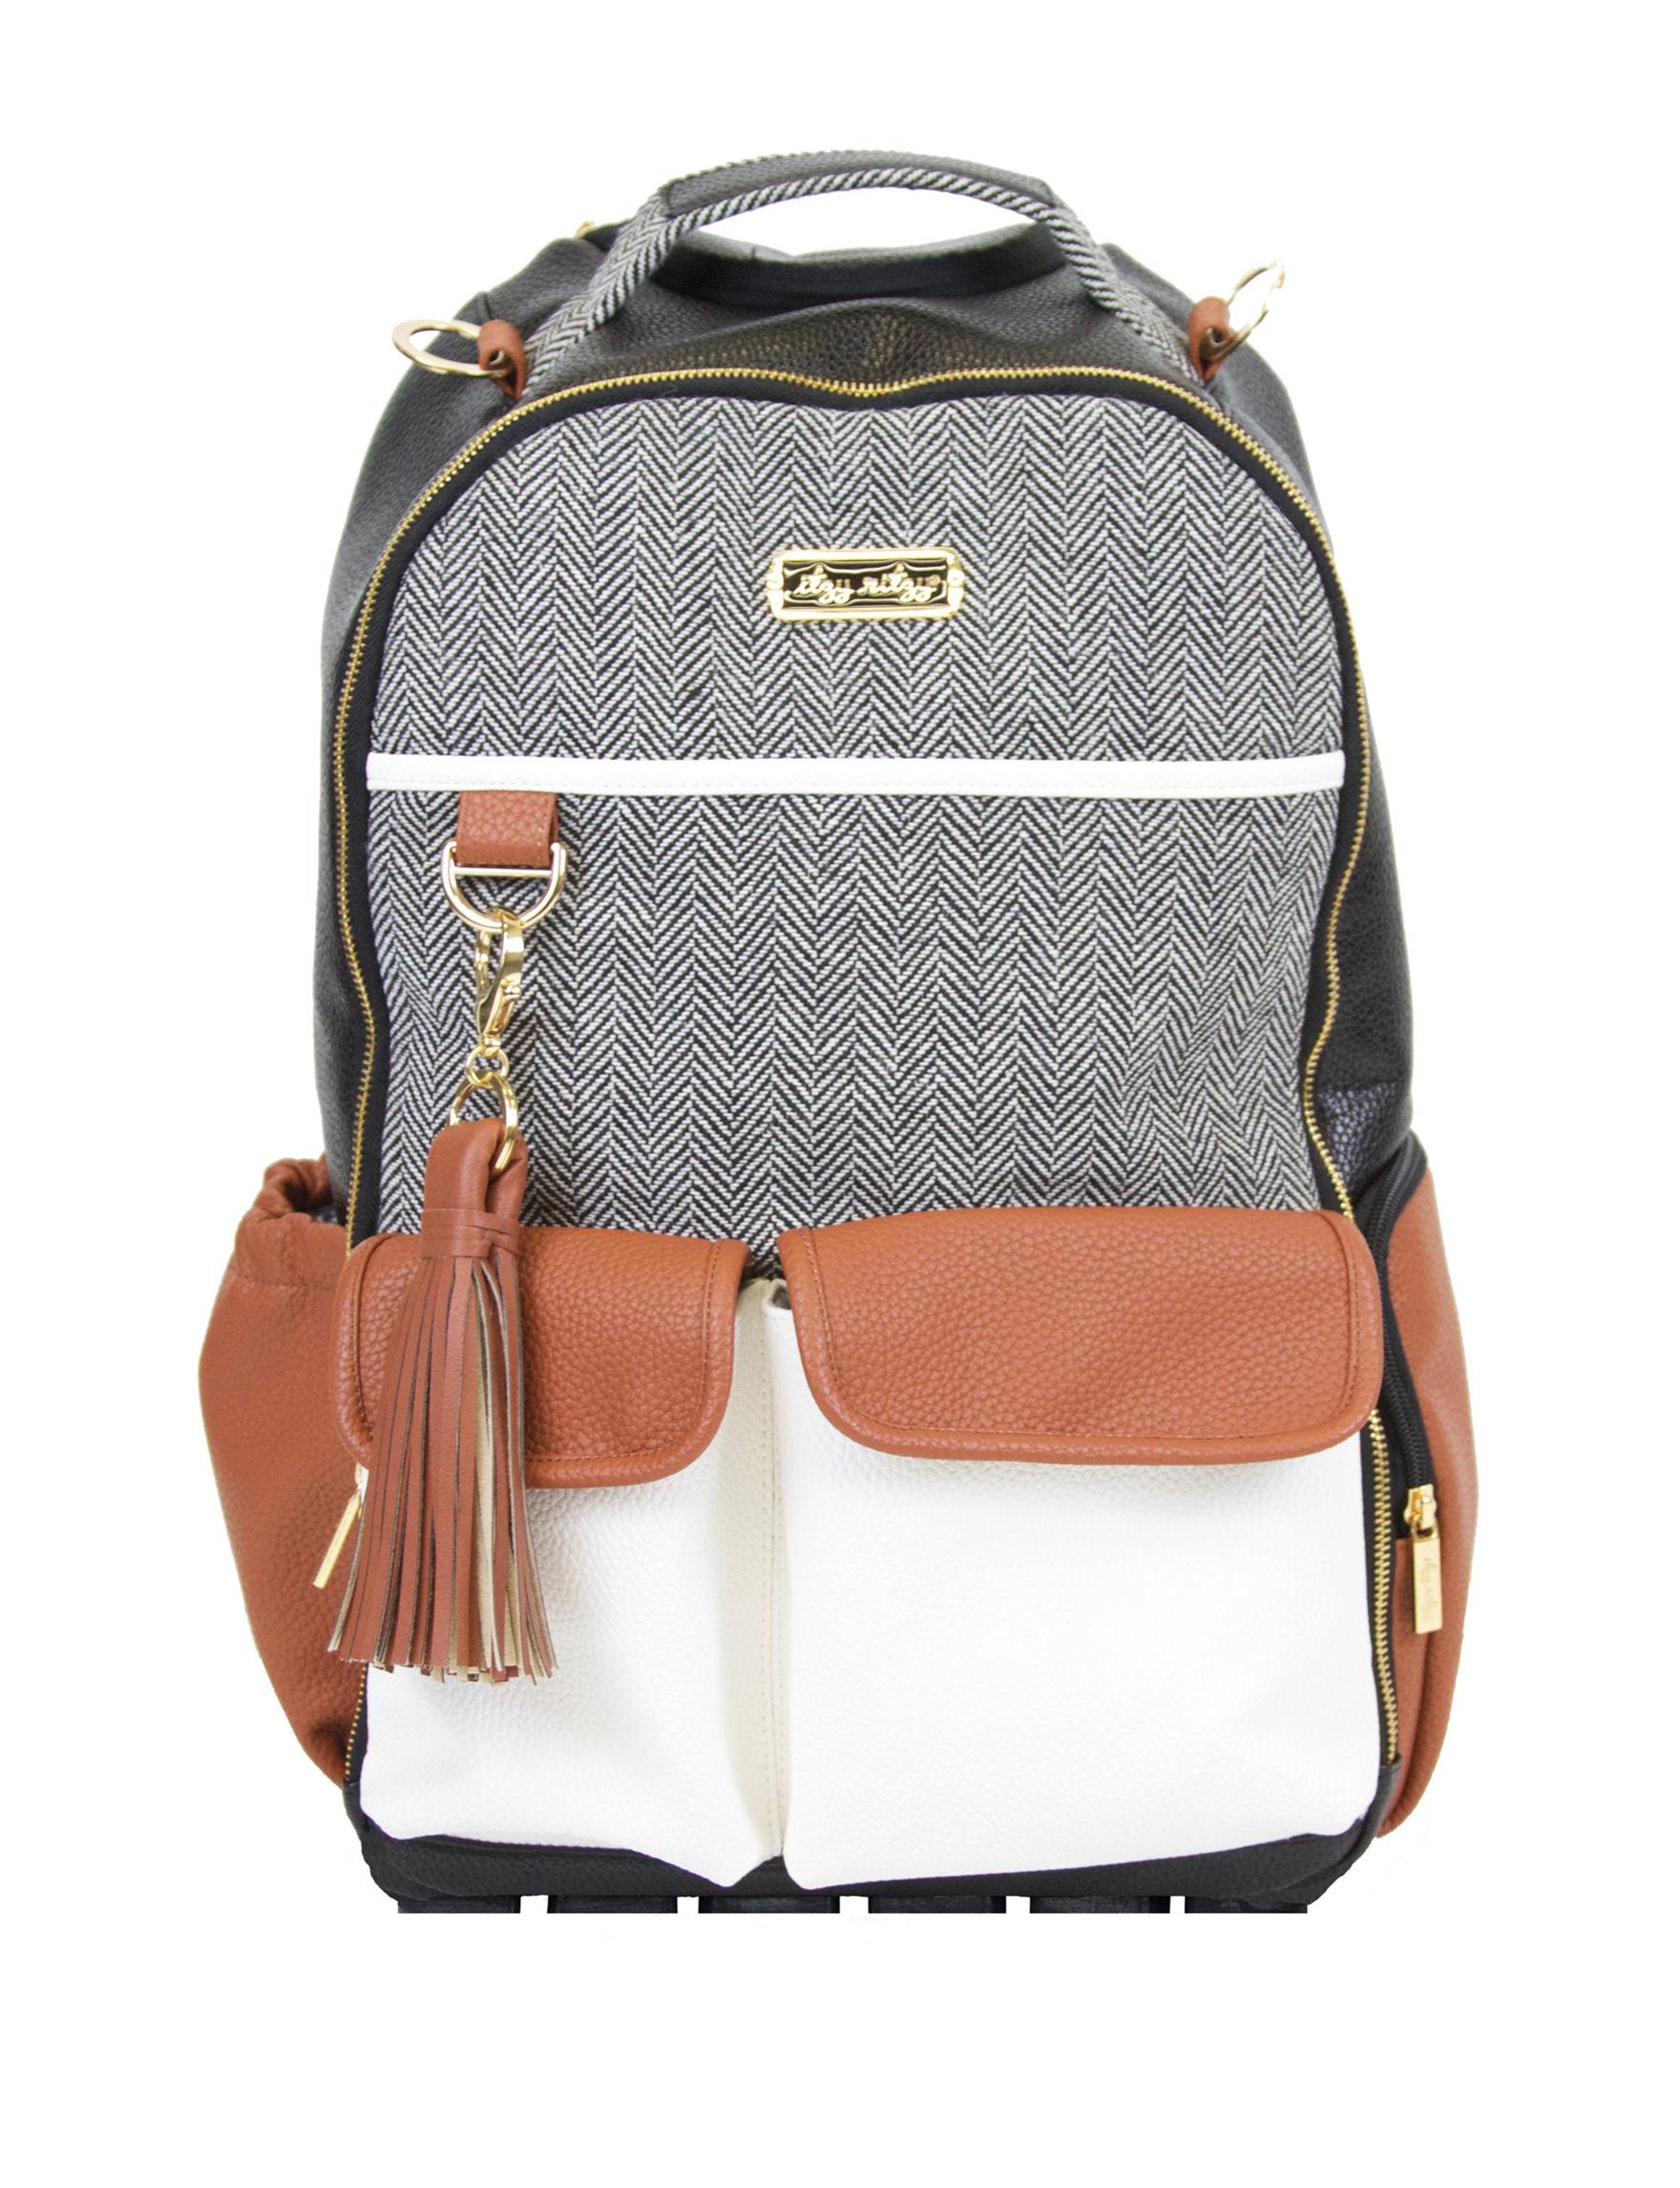 Itzy Ritzy Grey Multi Bookbags & Backpacks Diaper Bags